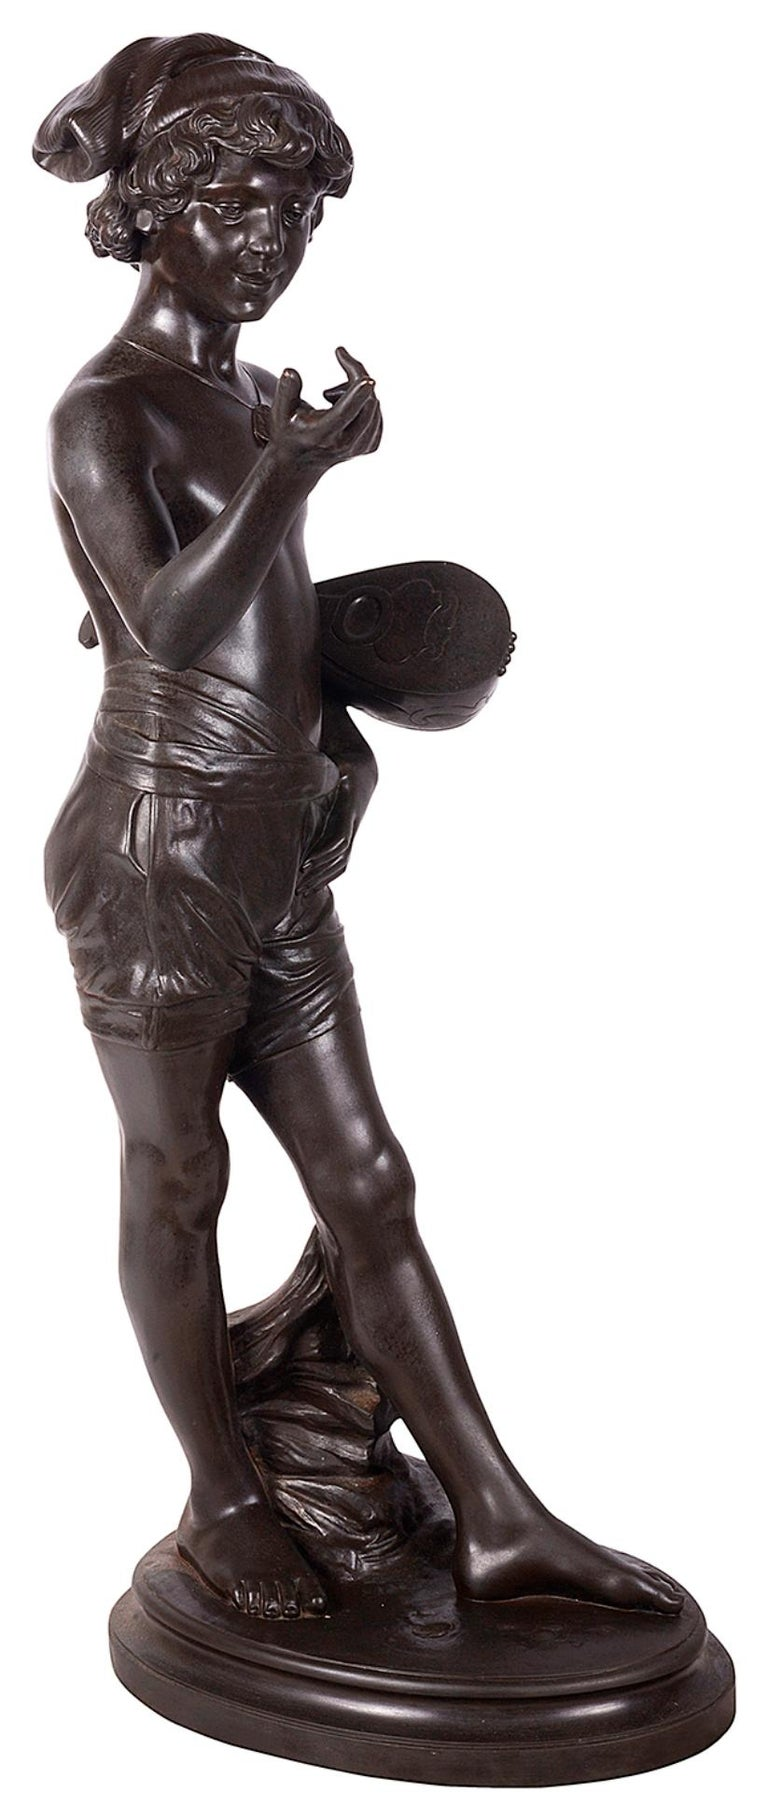 Romantic Classical Bronze Statue of Boy Holding a Mandolin, circa 1880 For Sale